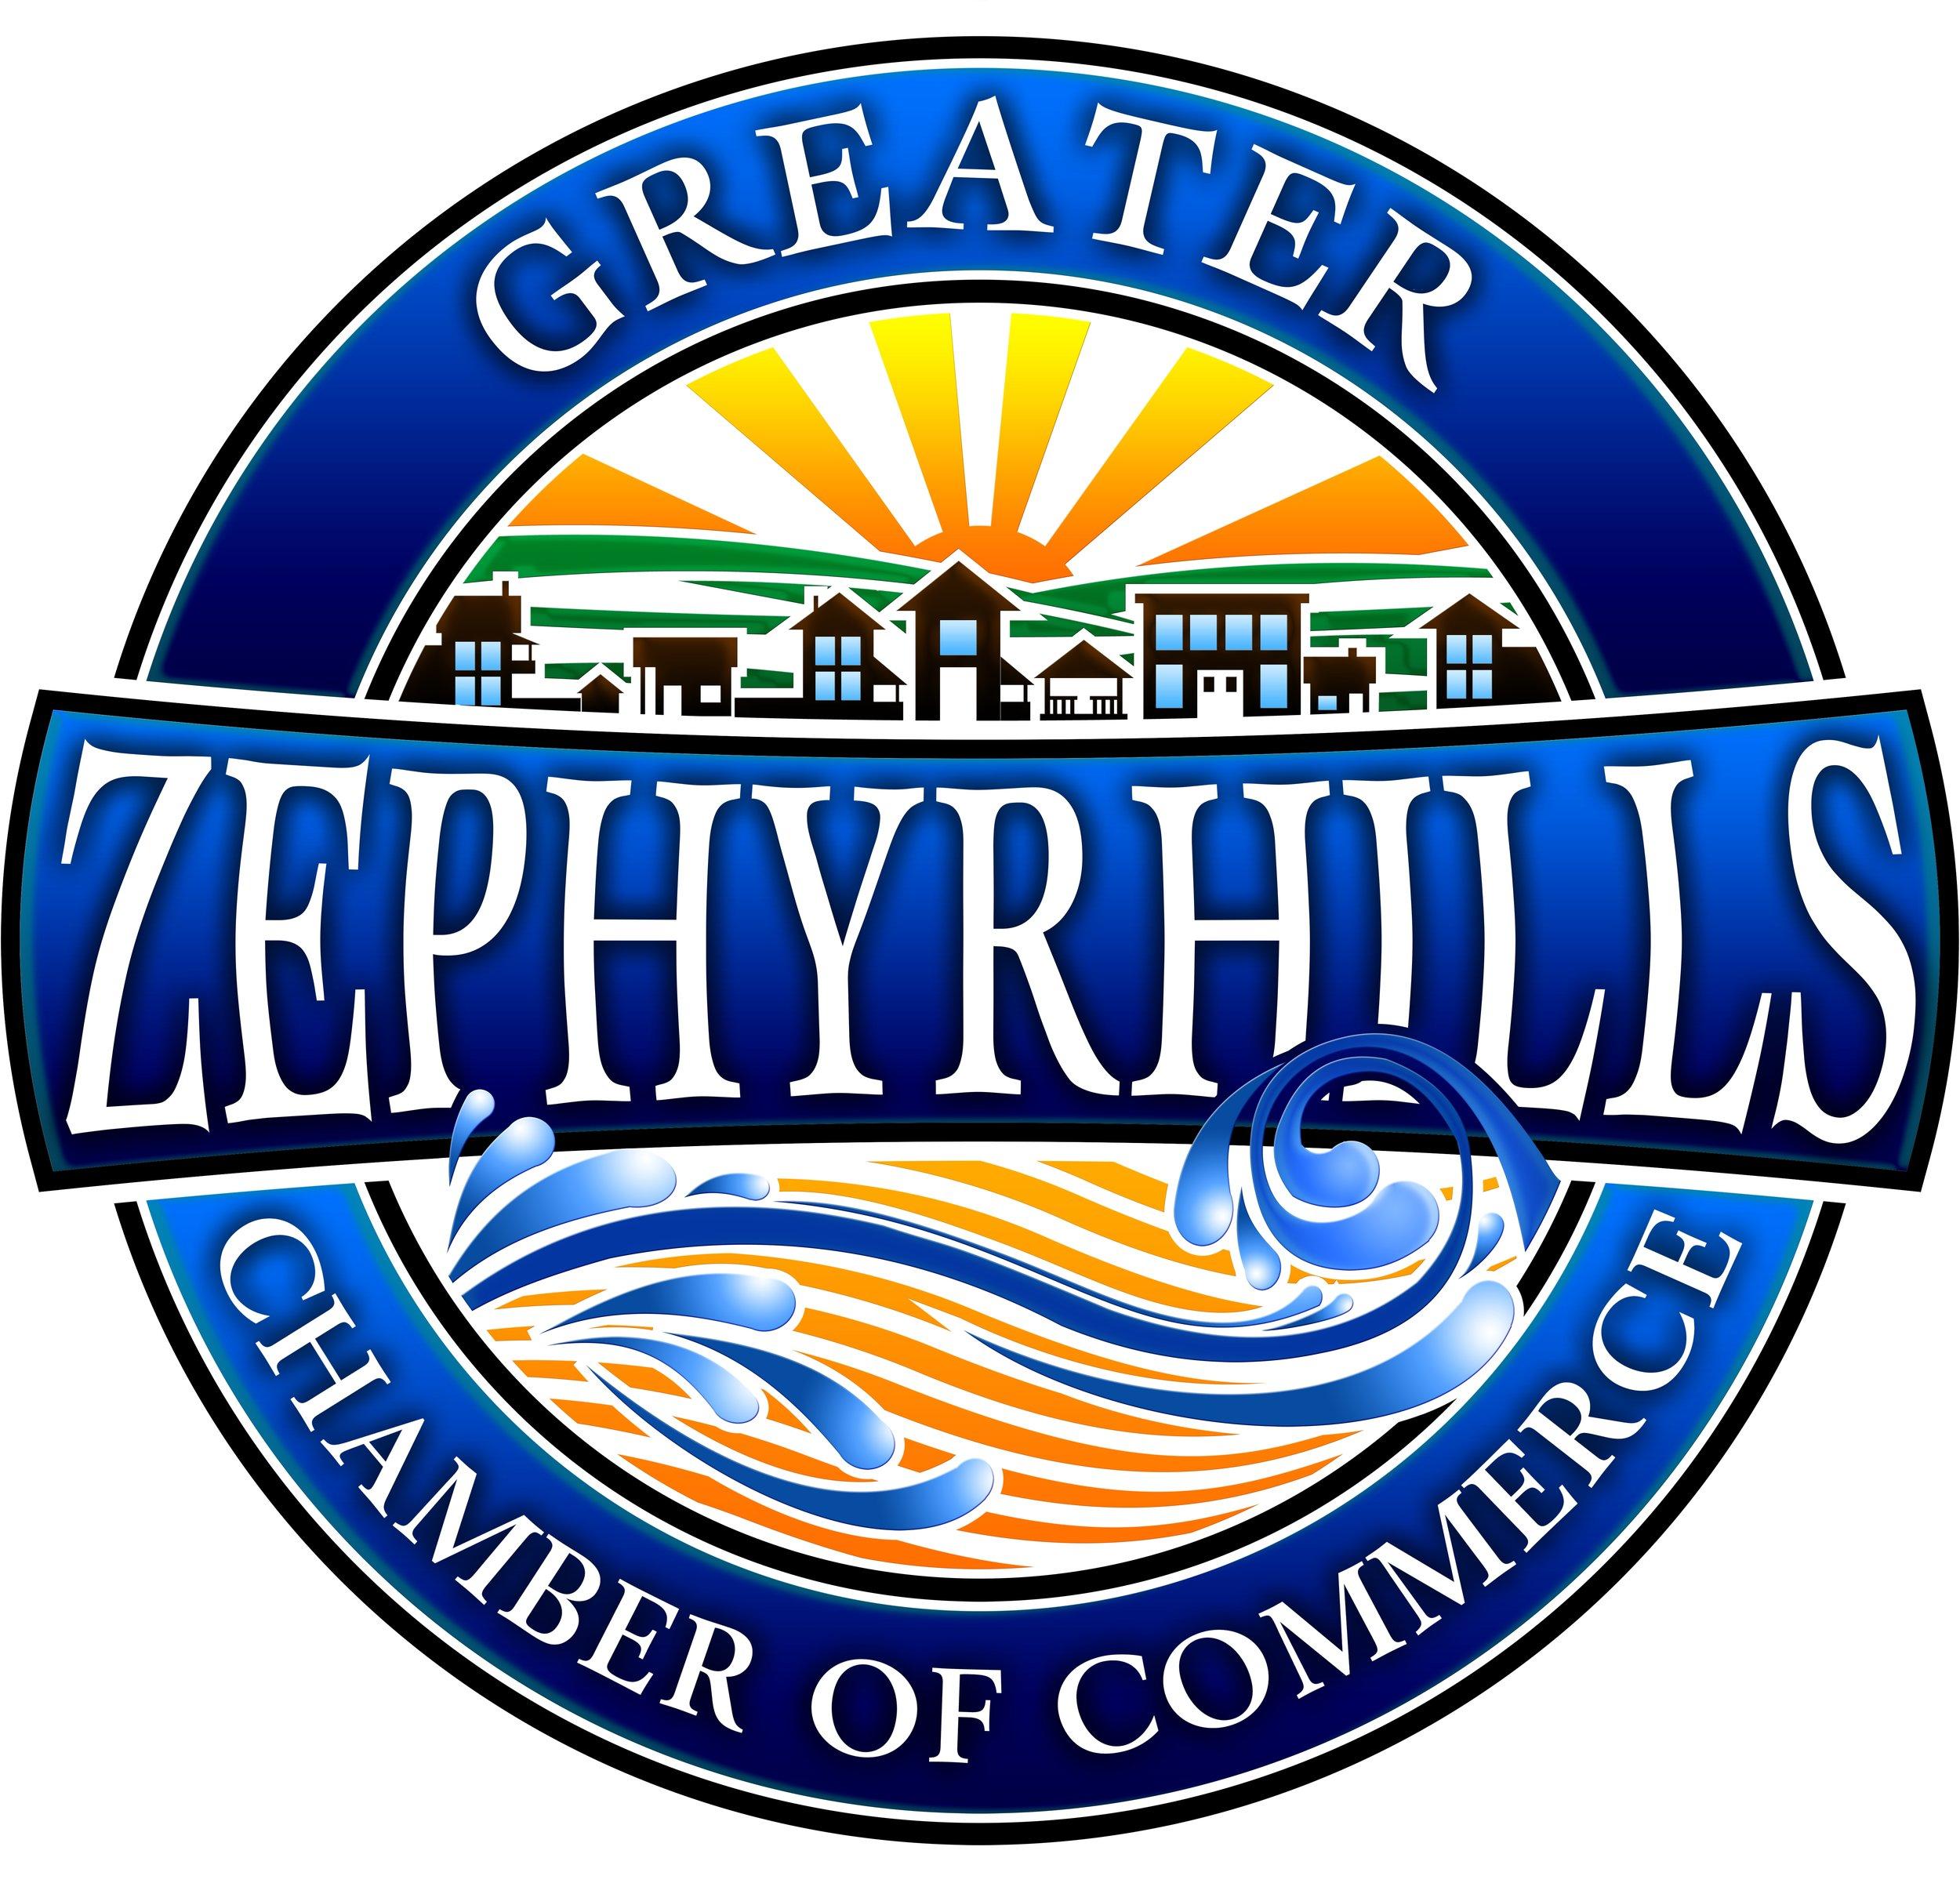 The Greater Zephyrhills Chamber of Commerce